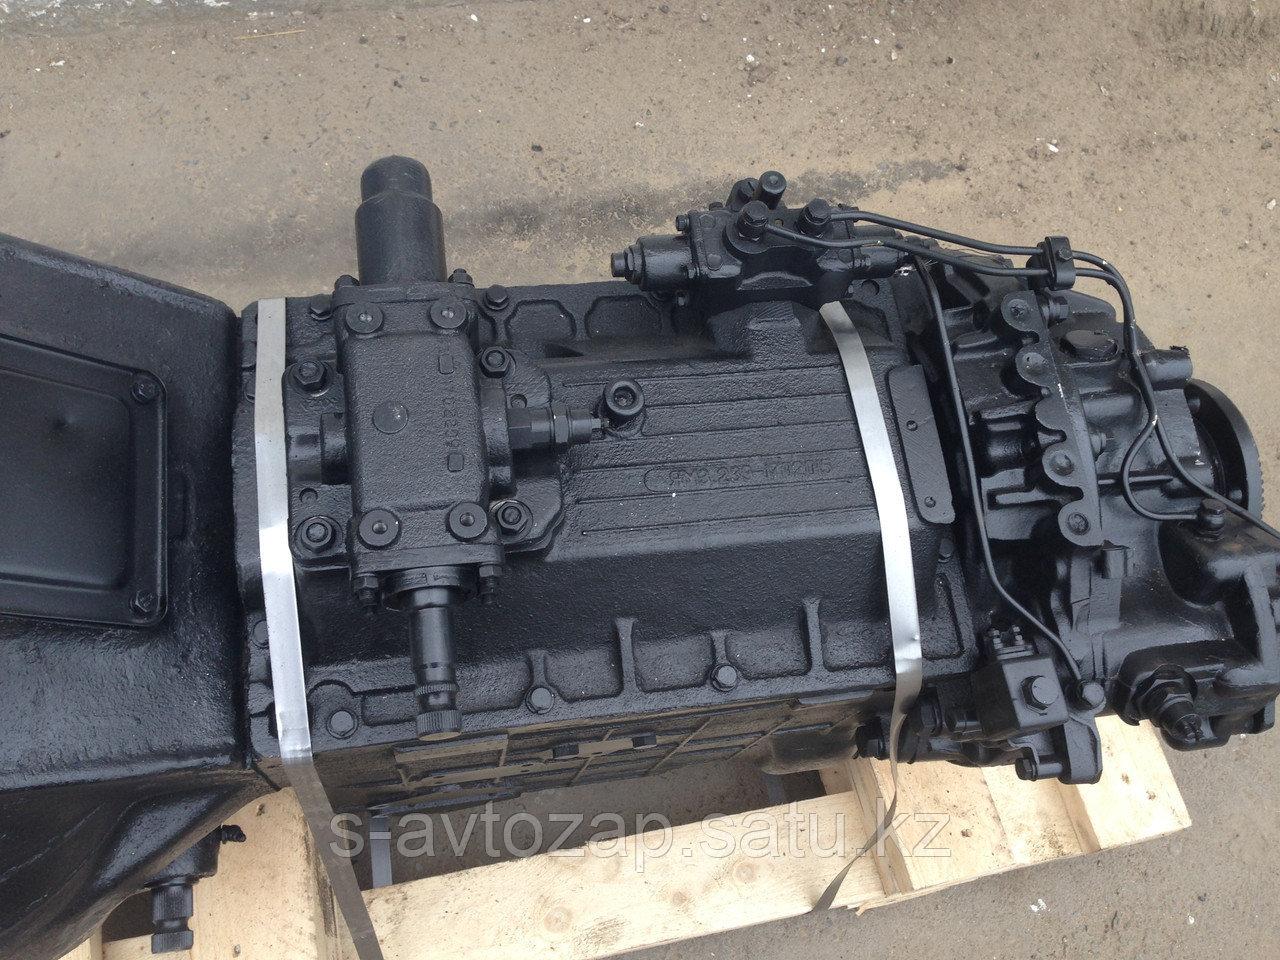 Коробка переключения передач для двигателя ЯМЗ 239-1700025-02